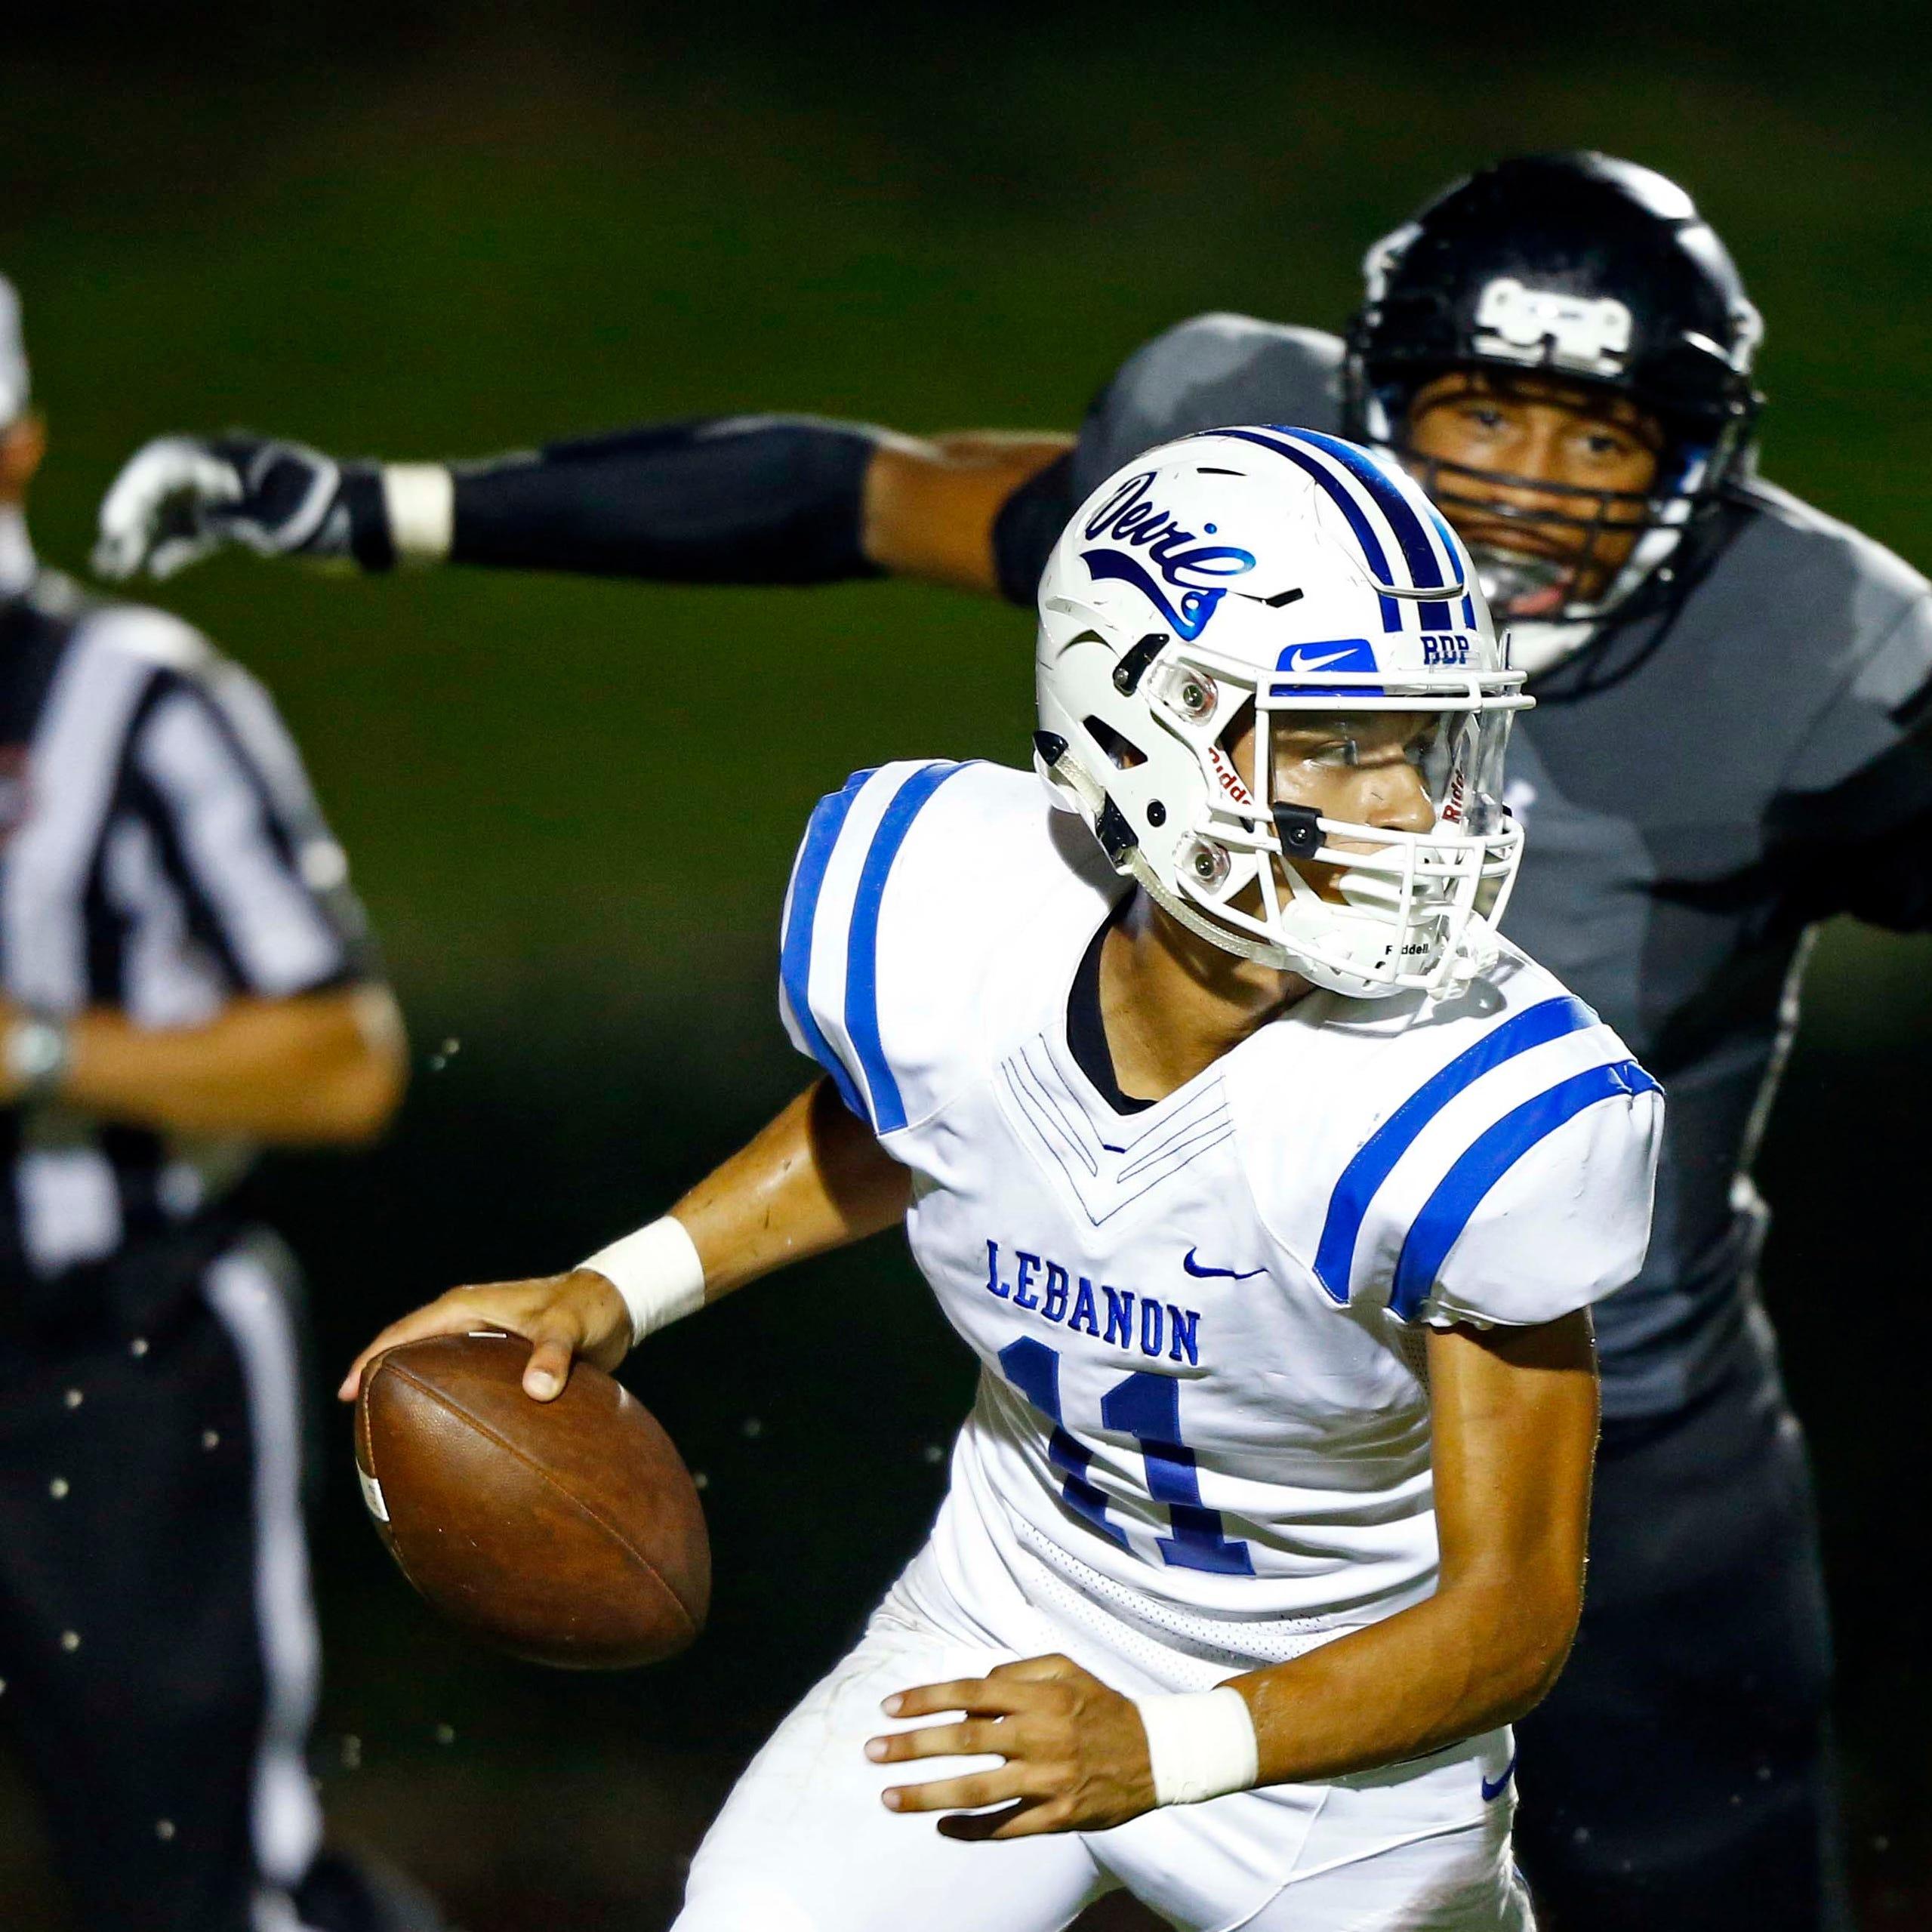 Reggie Grimes II, top 2020 college football prospect in Tennessee, has Alabama, Tennessee, Vanderbilt among top 6 schools